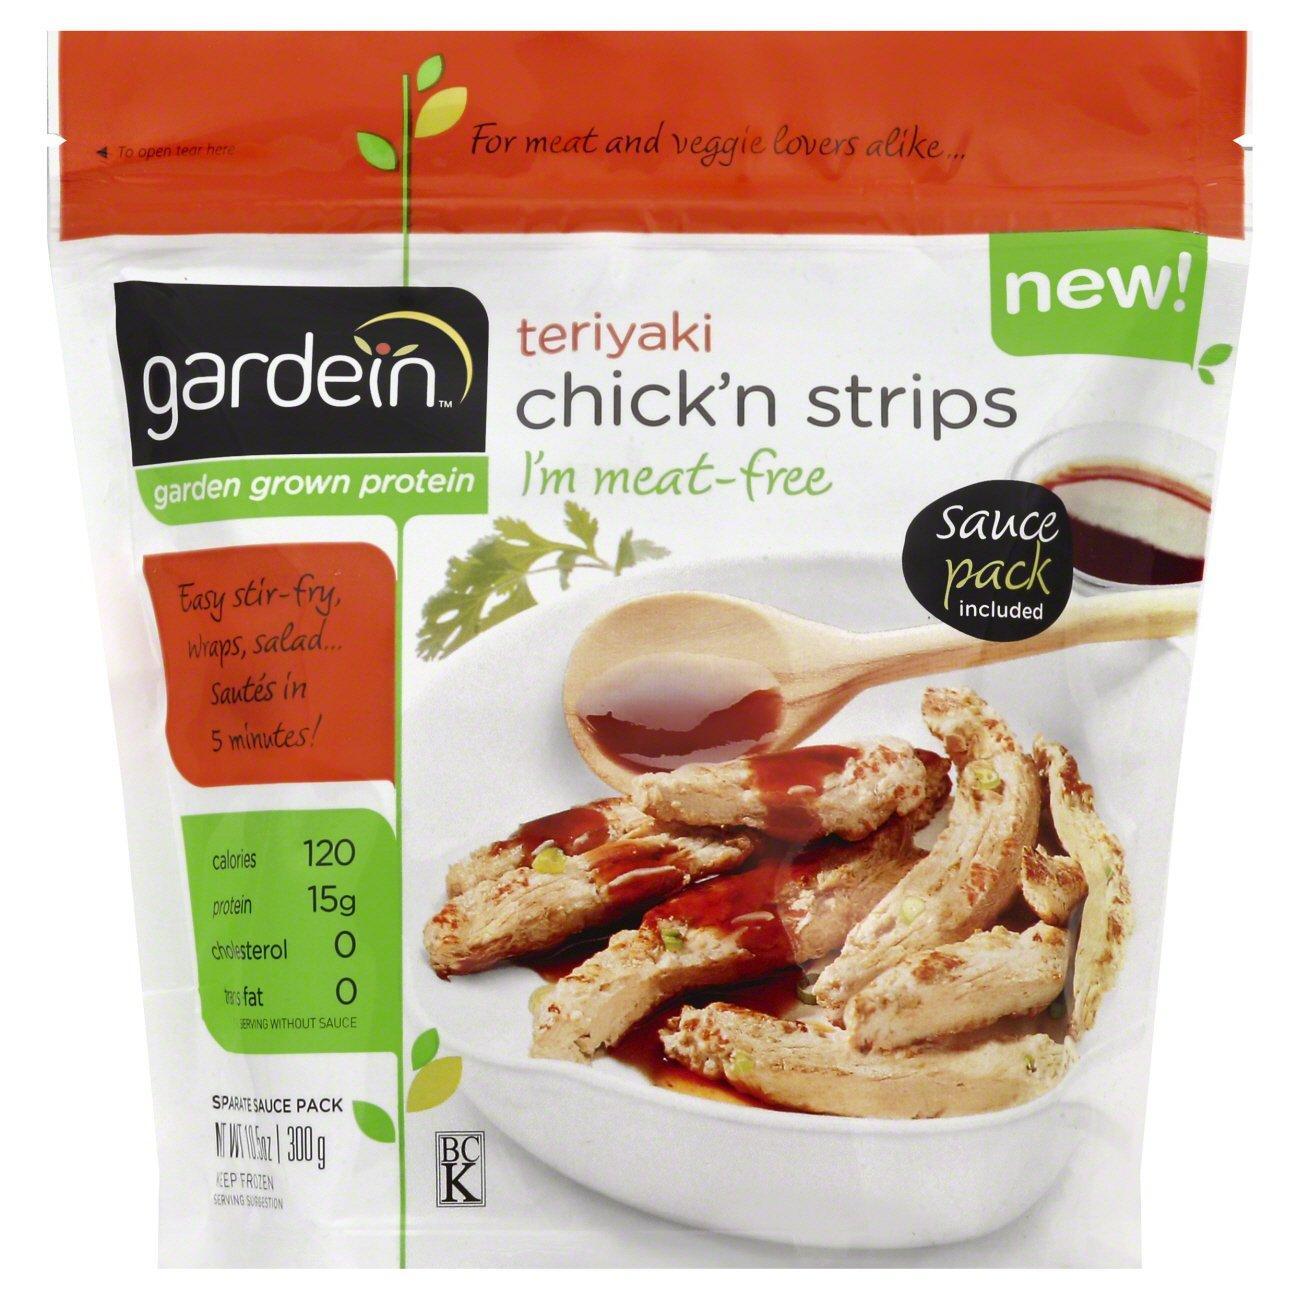 Gardein Teriyaki Chick N Strips Meat Free Shop Meat Alternatives At H E B